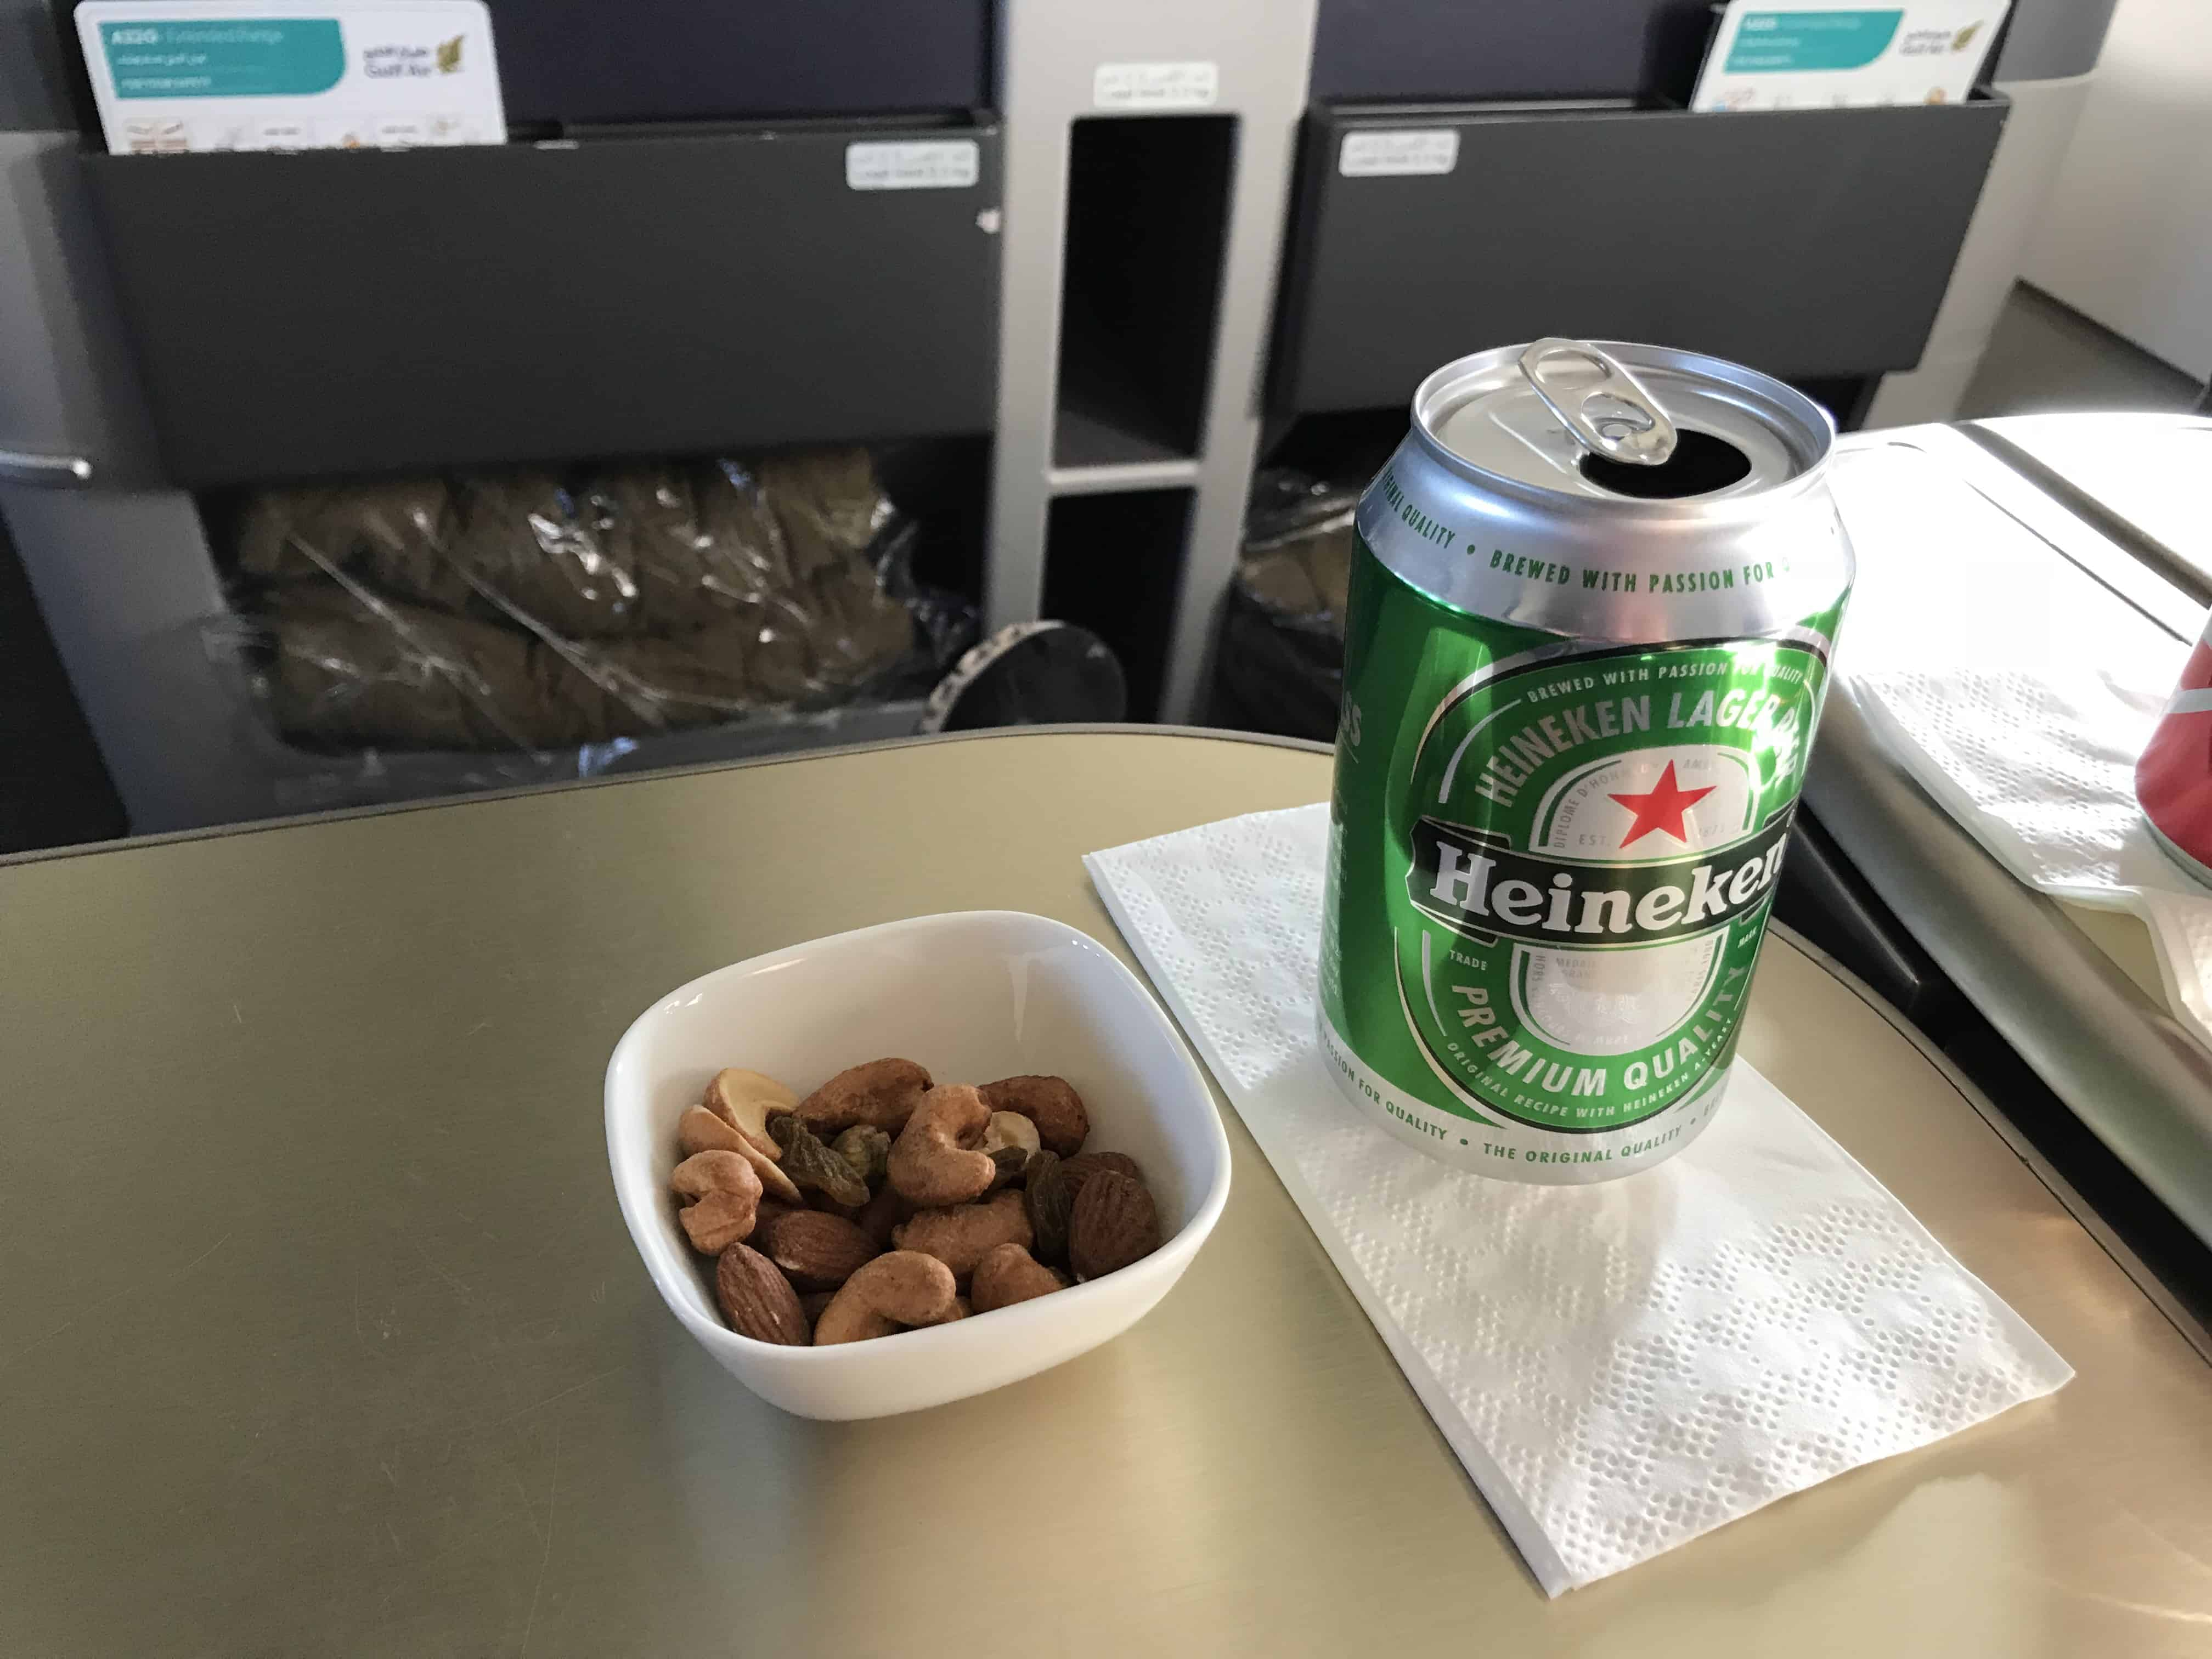 Gulf Air Bewertung - Verpflegung